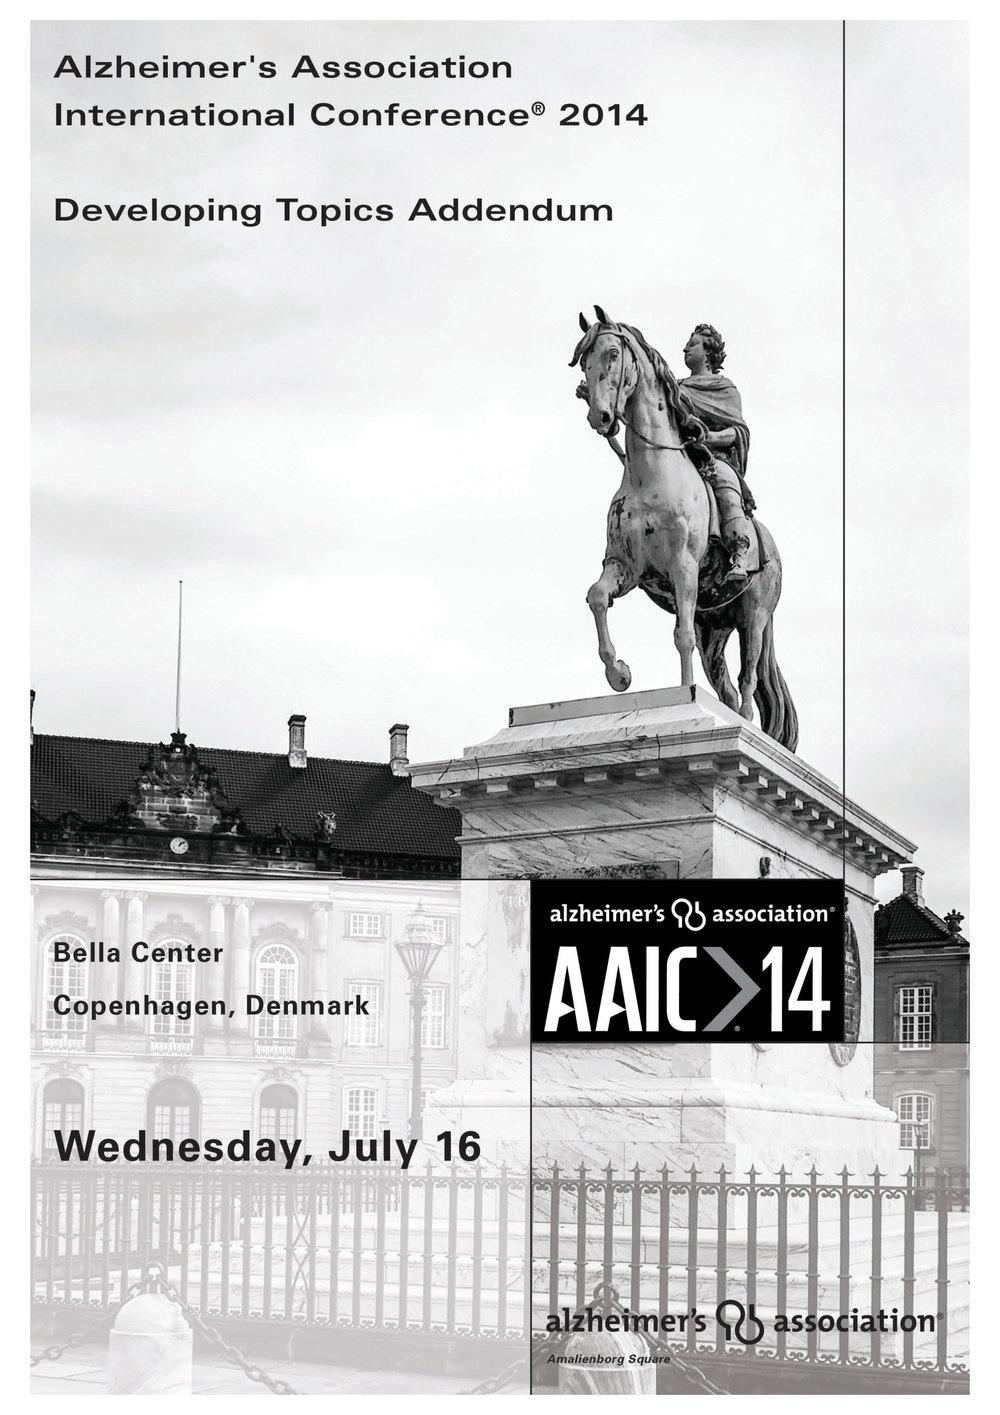 AAIC14 DEVELOPING TOPICS ADDENDA